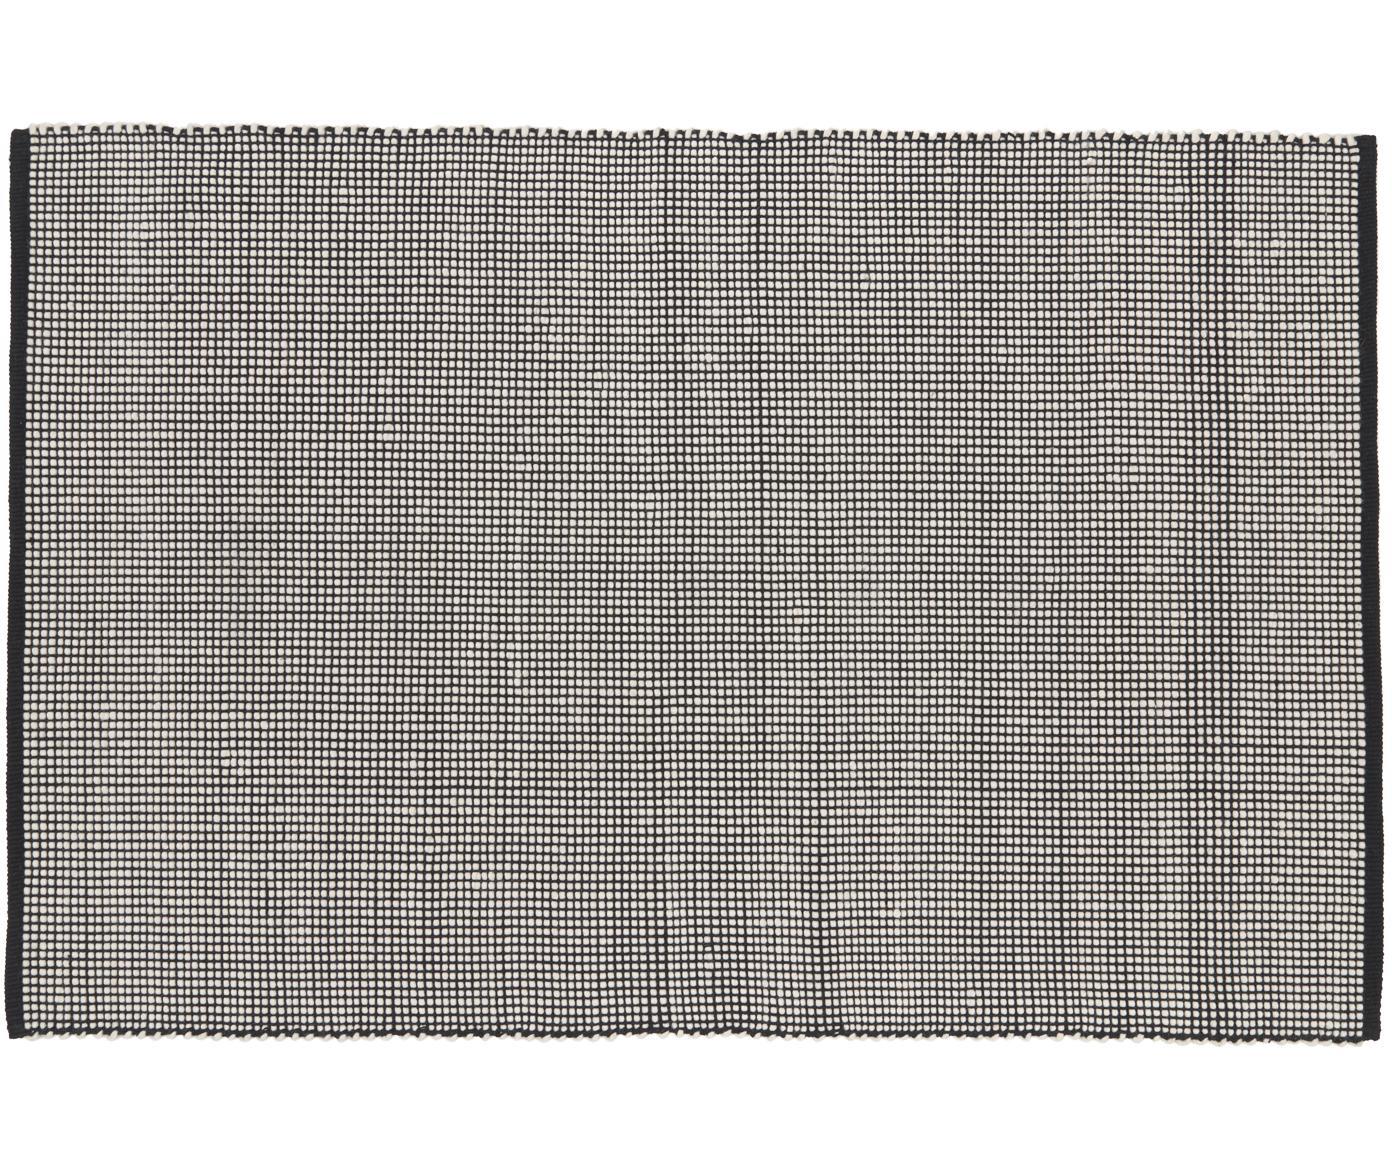 Alfombra de lana tejida a mano Amaro, Negro, blanco crema, An 120 x L 180 cm (Tamaño S)